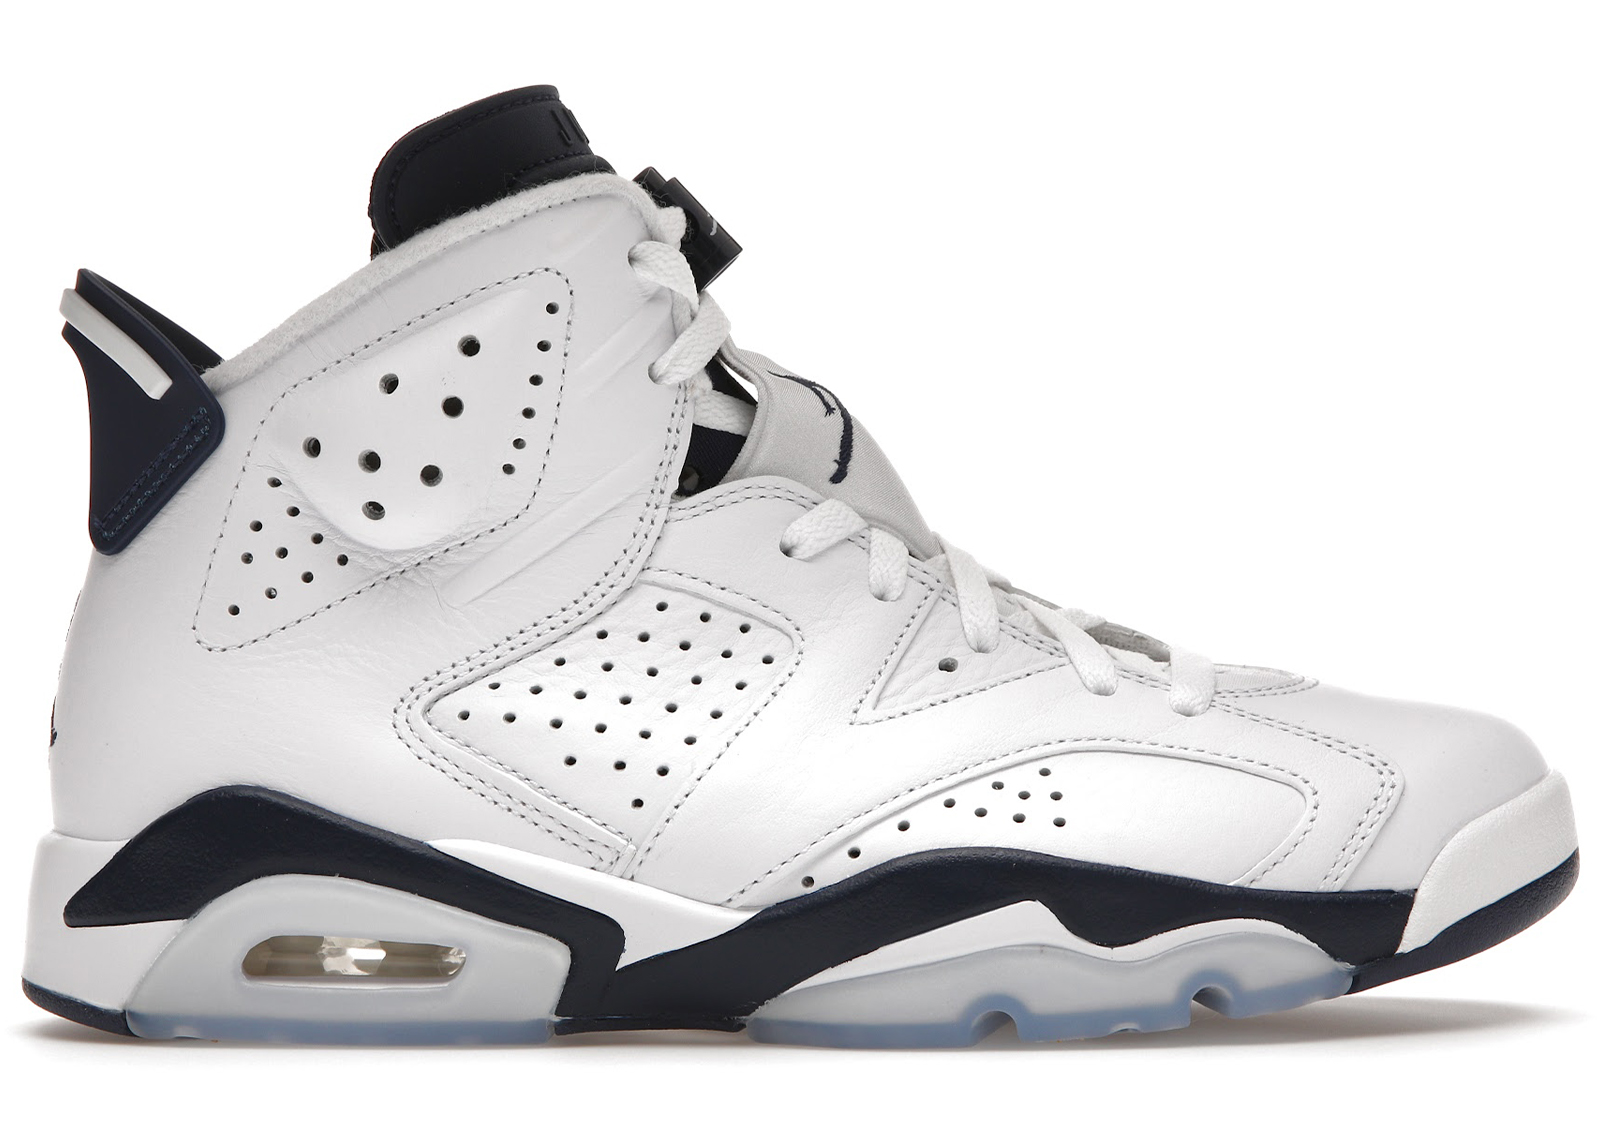 Nike Air Huarache Scream Green (2021)